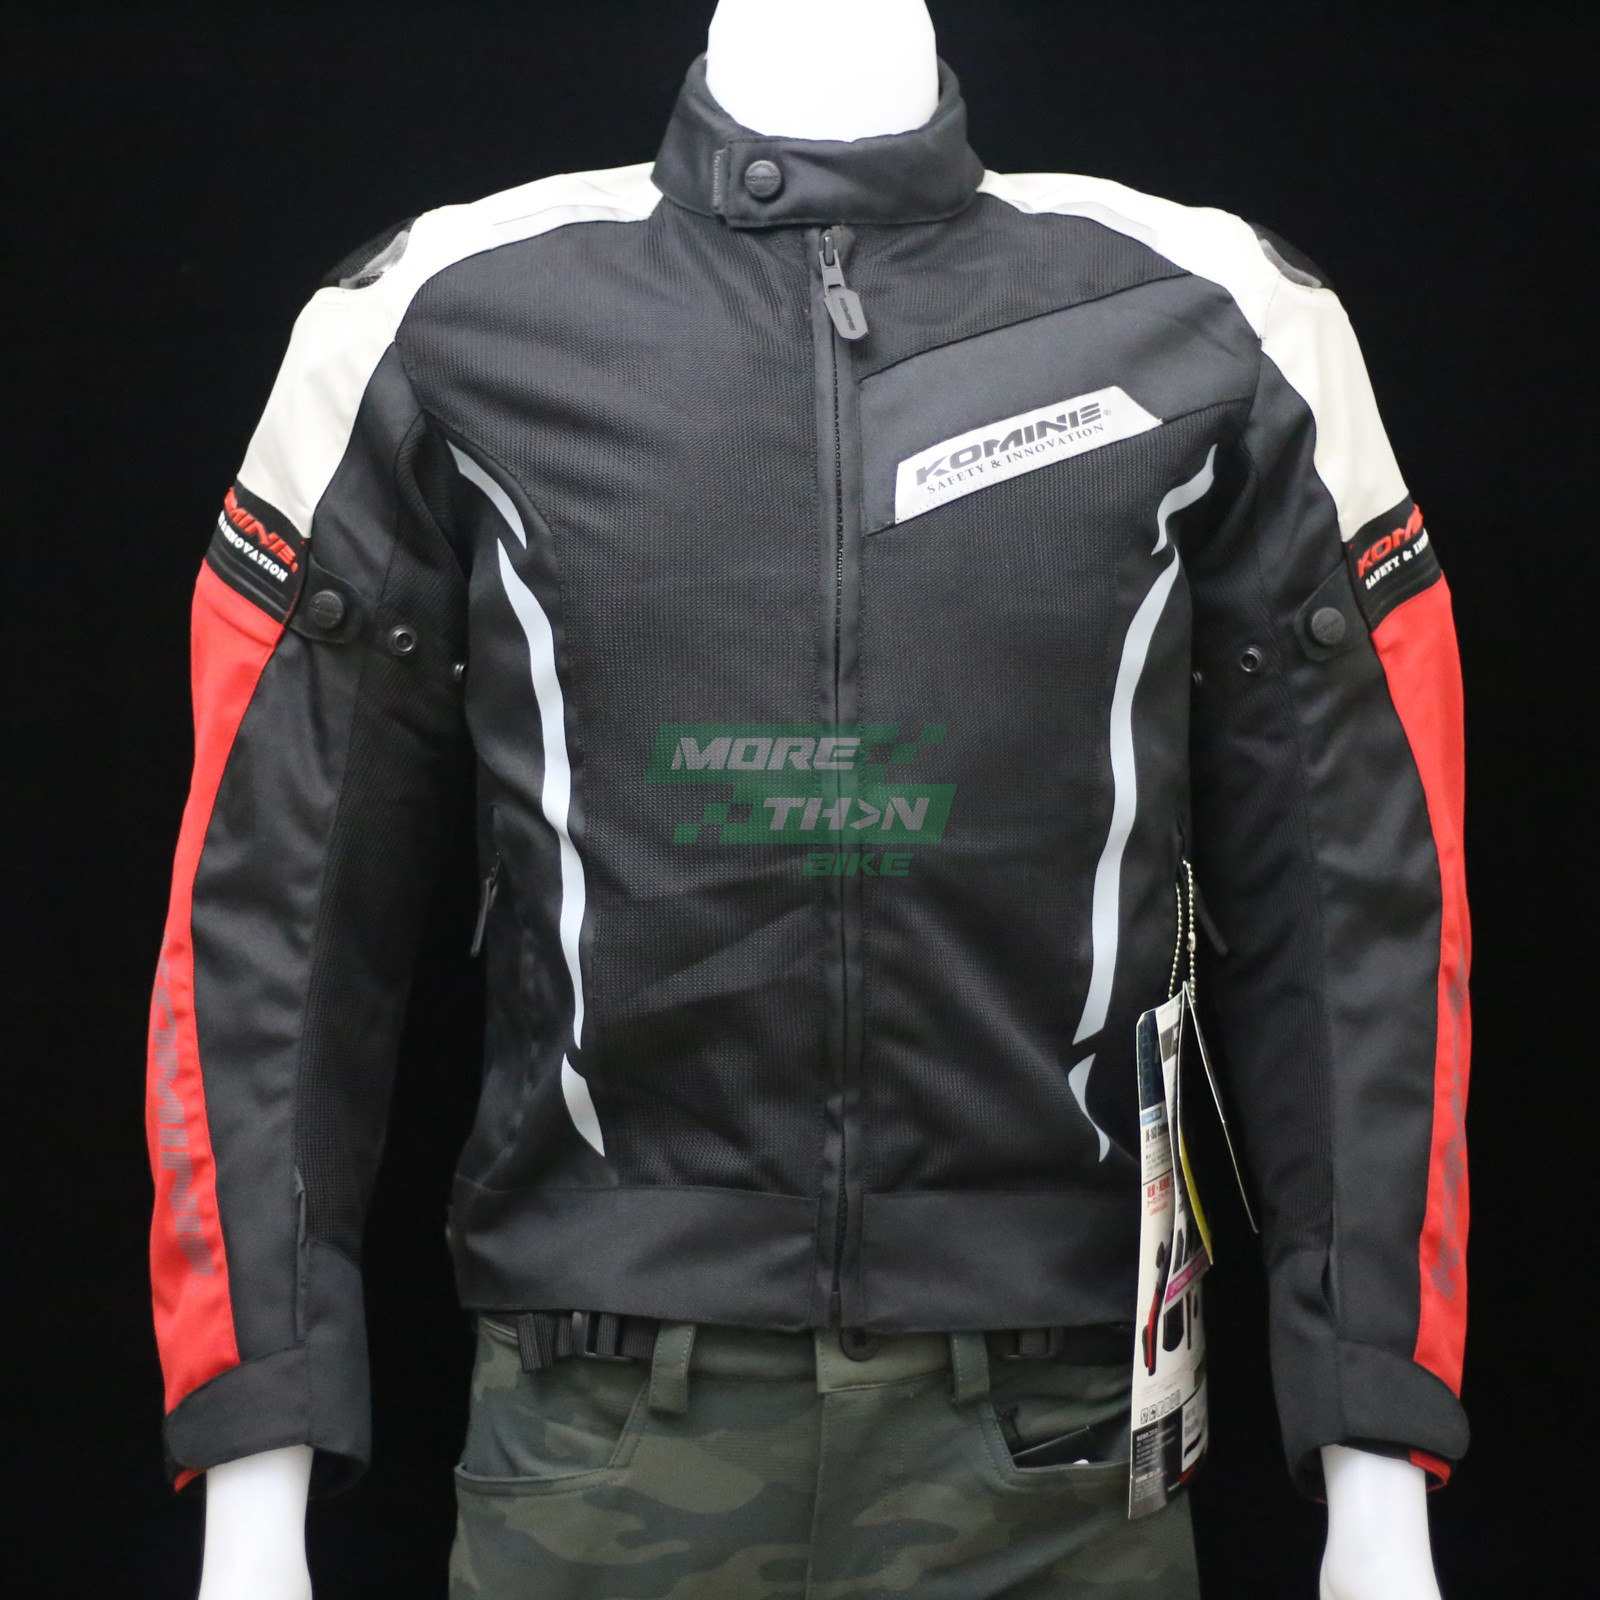 KOMINE JK-103 Carbon Protect Mesh Jacket 1